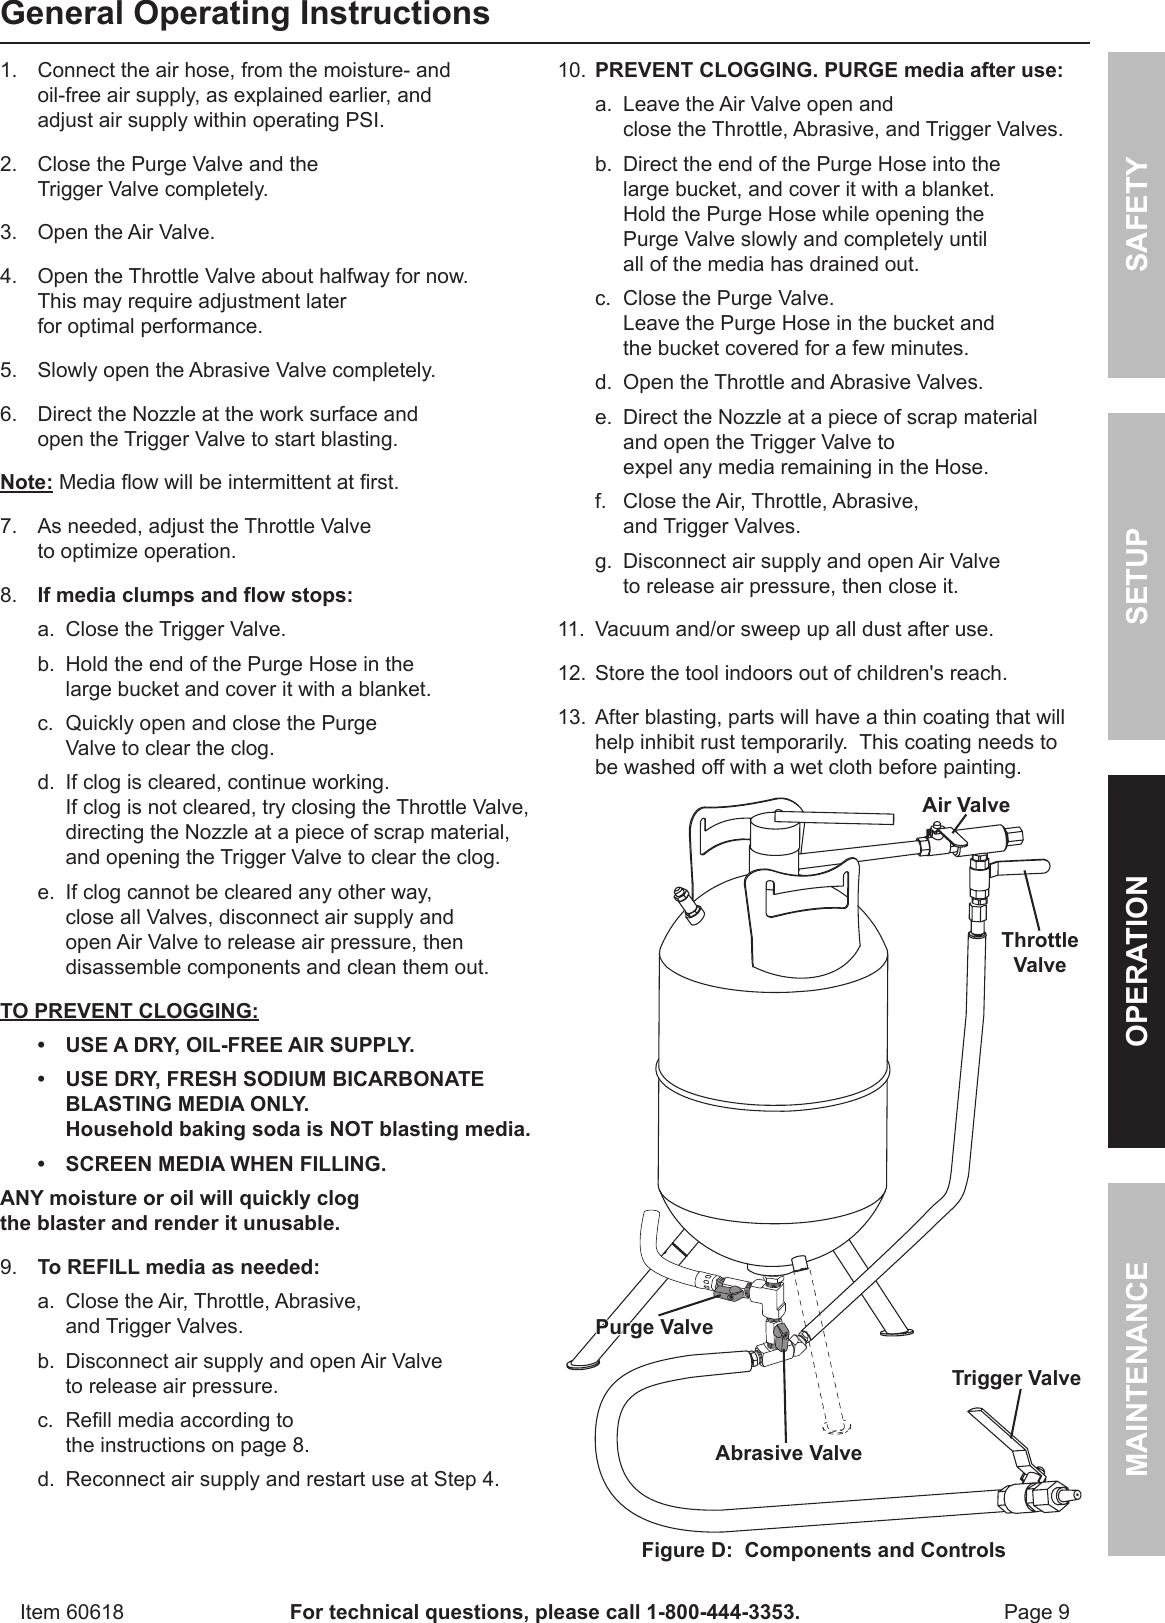 Harbor Freight Soda Blast Conversion Kit Product Manual